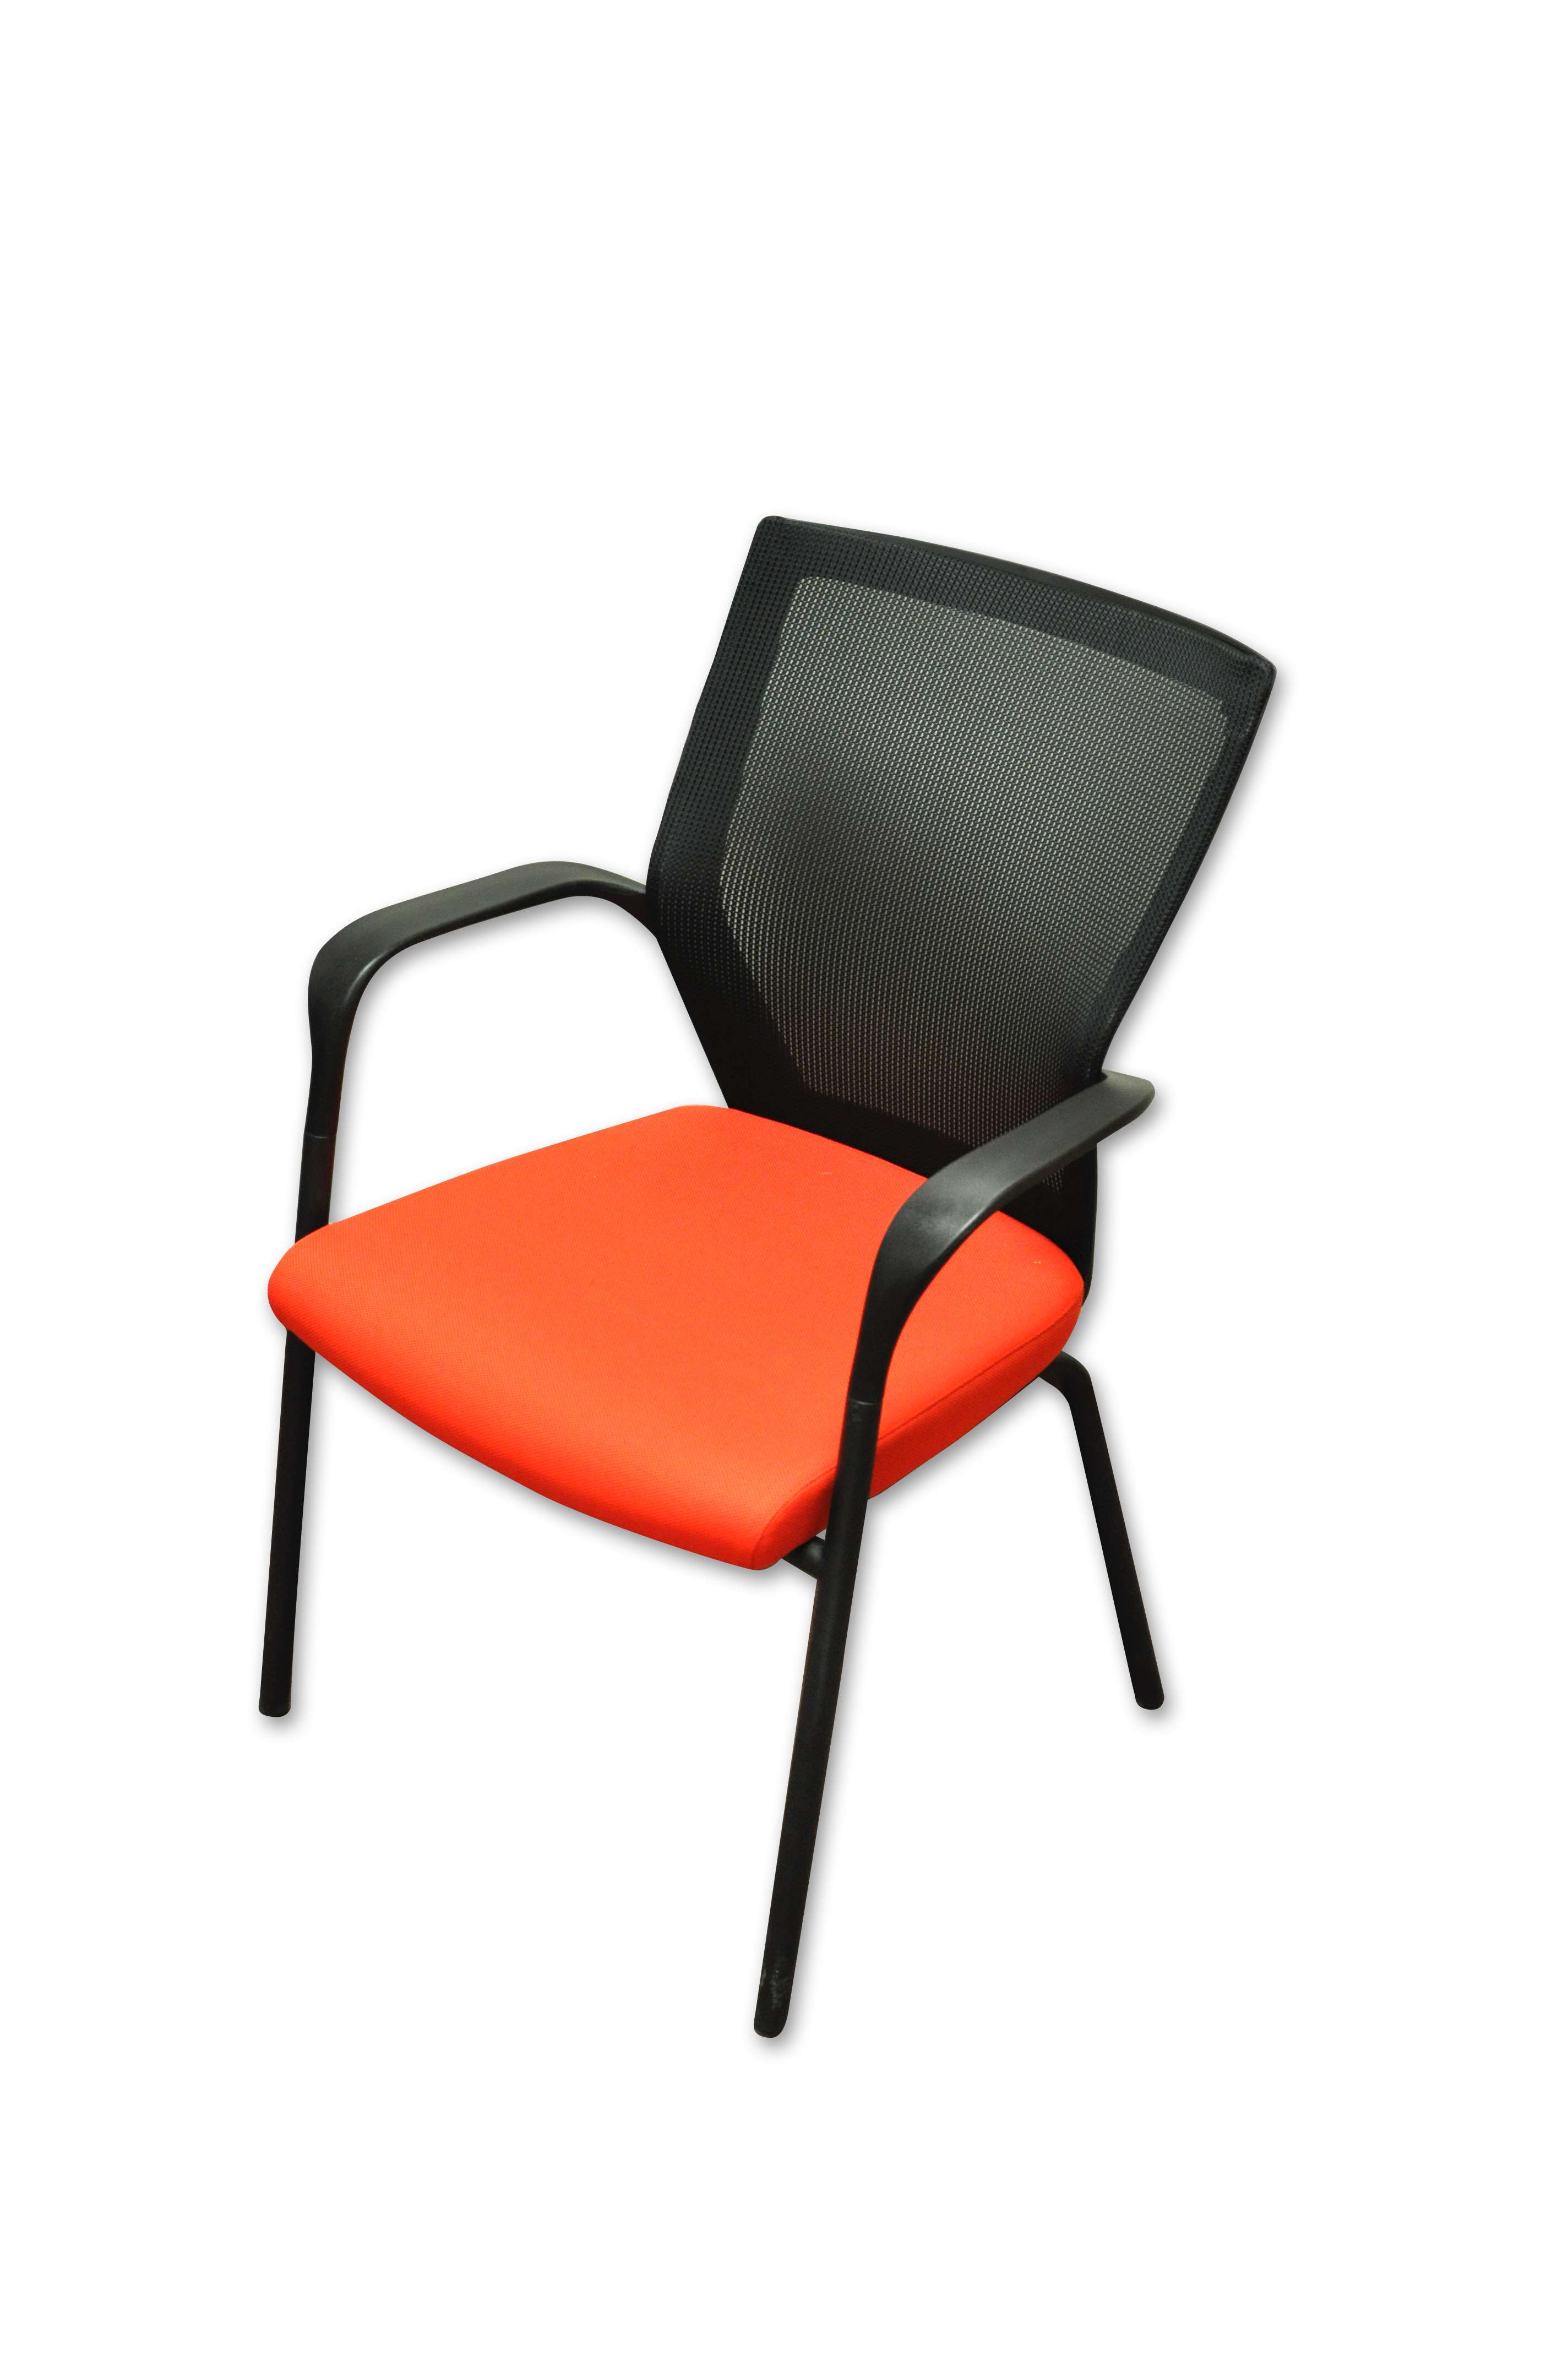 fice Chairs Minneapolis Milwaukee Podany s